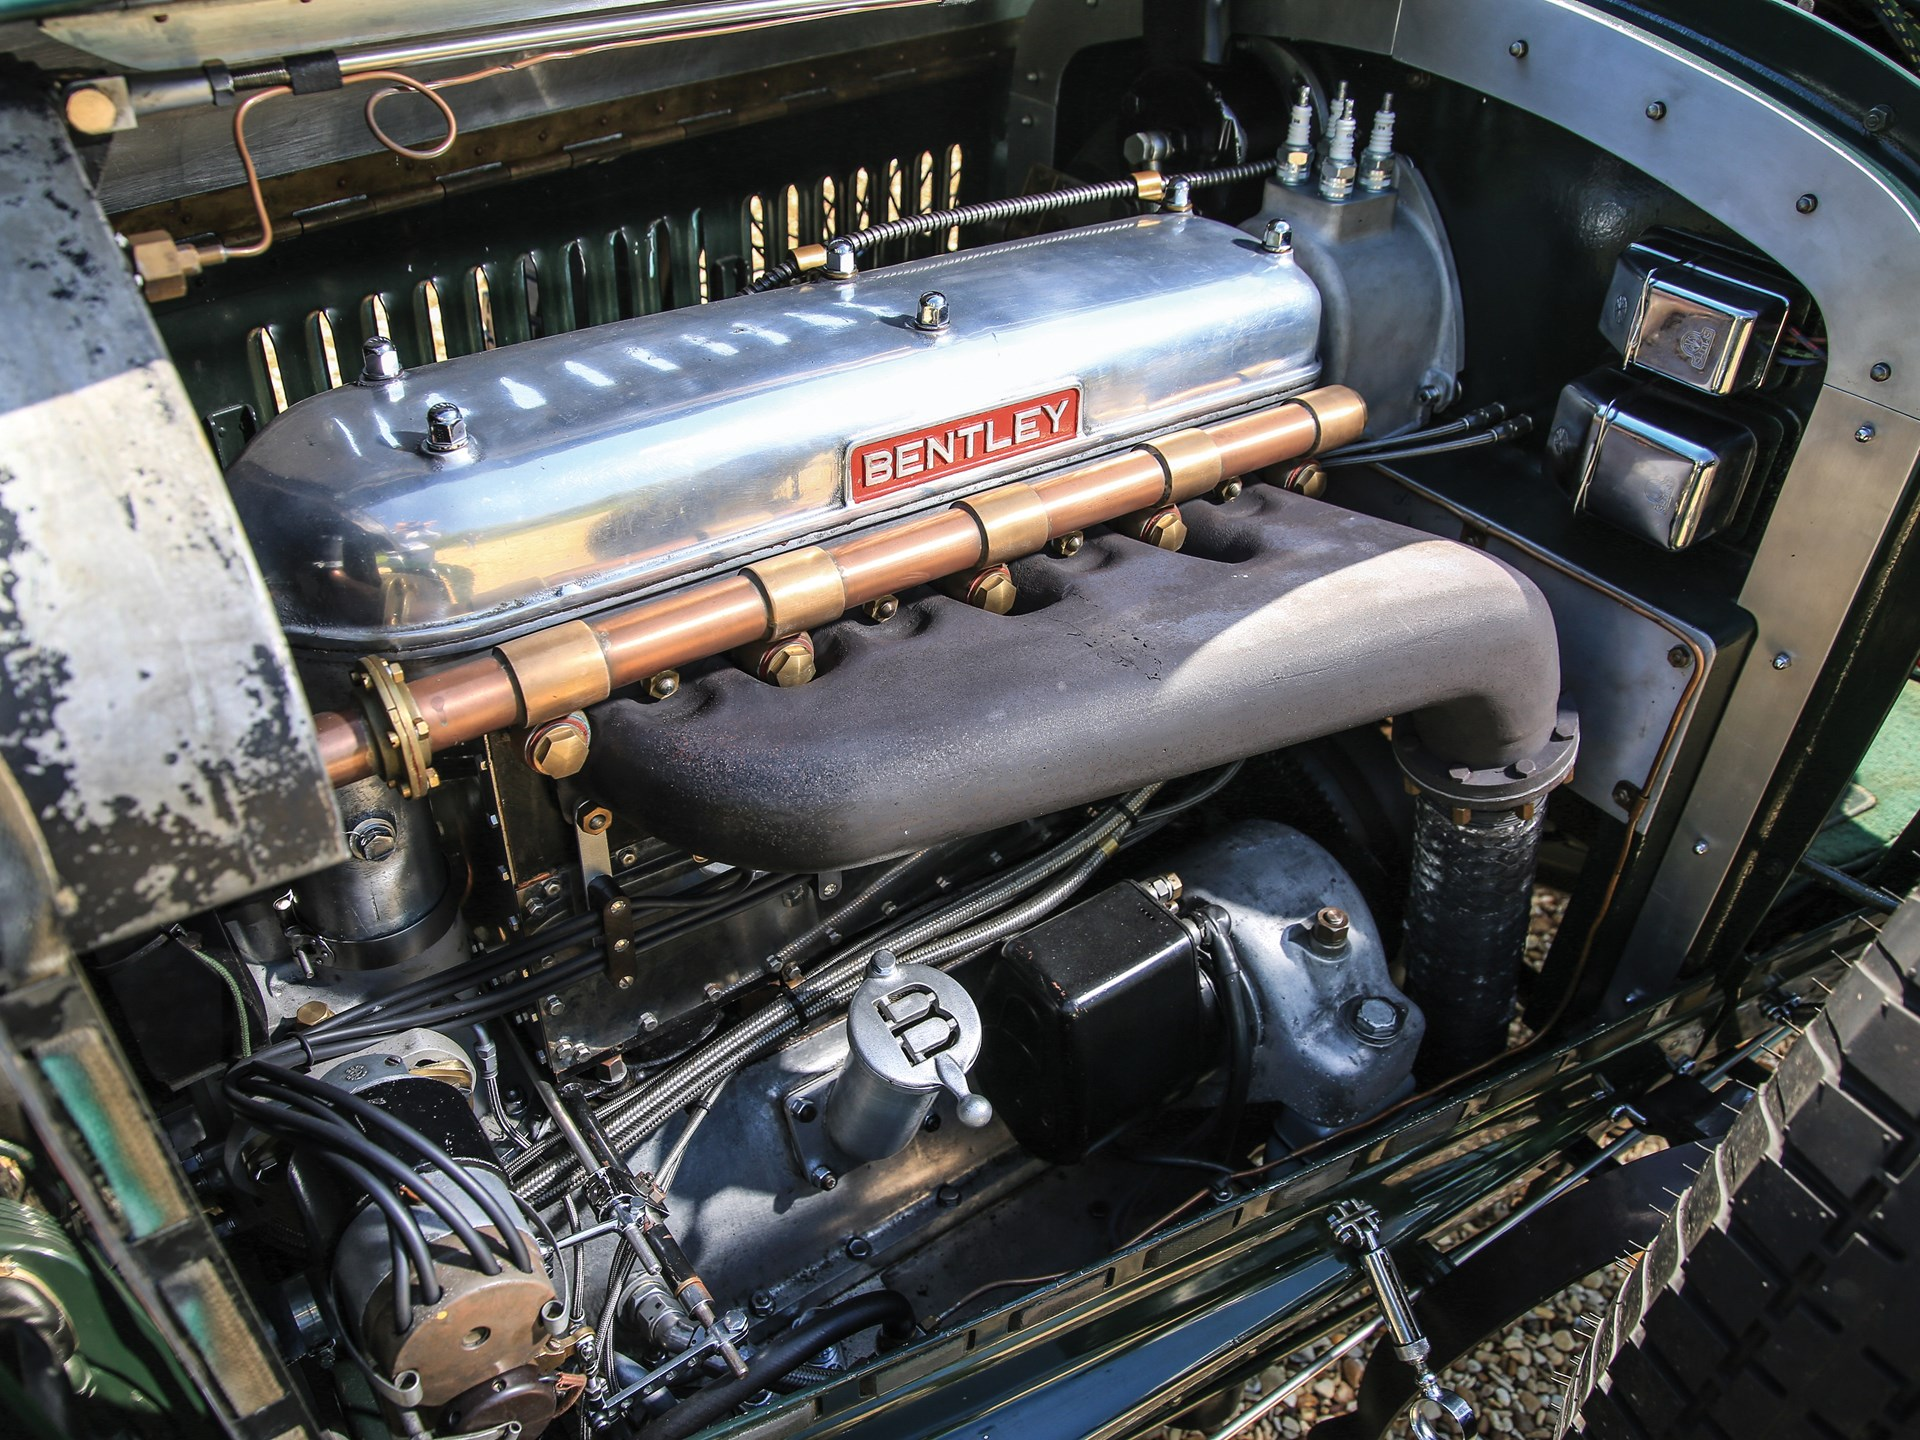 1929 Bentley 4½-Litre Supercharged Tourer Recreation by Graham Moss